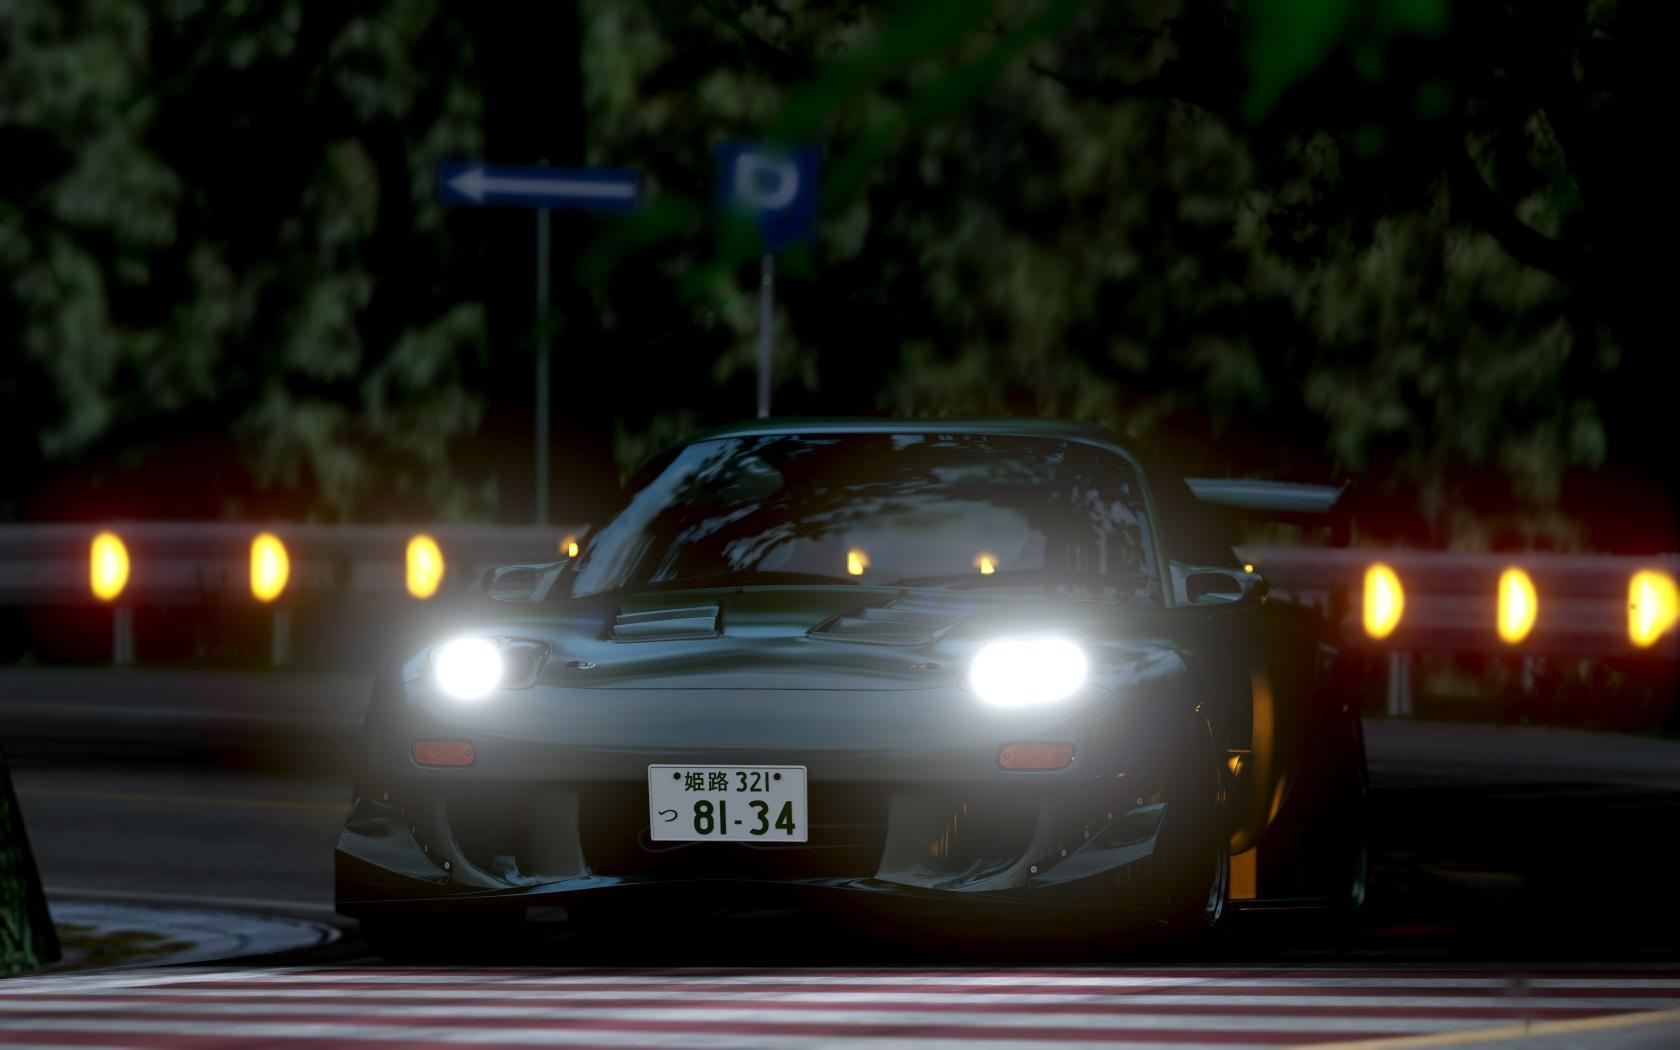 Screenshot_mazda_rx7_easy_final_spec_harugahara_touge_25-11-118-22-33-59.jpg